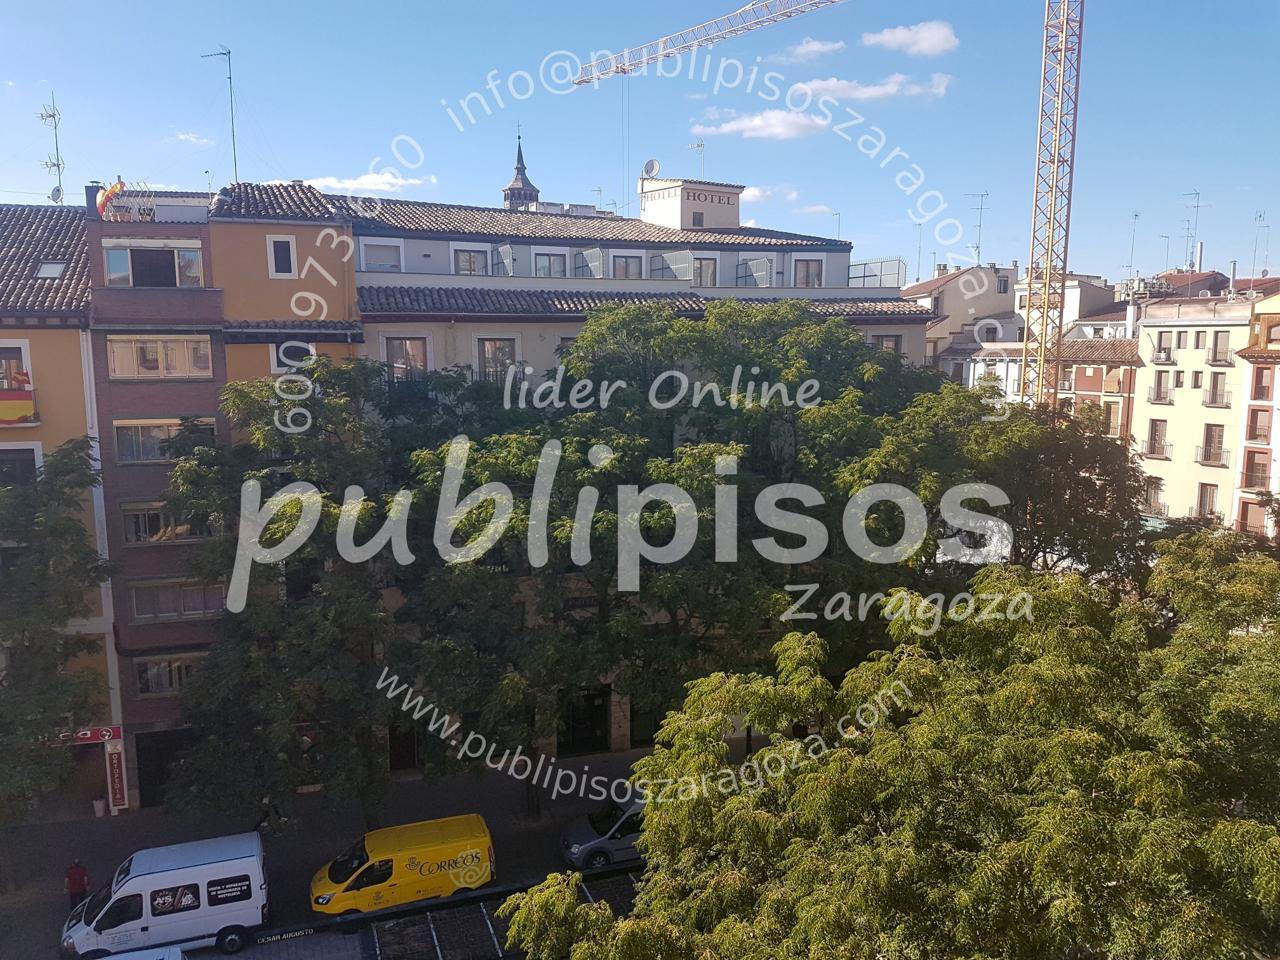 Venta Atico Duplex Obra Nueva Centro Casco Histórico Zaragoza|PUBLIPISOS Inmobiliarias-17